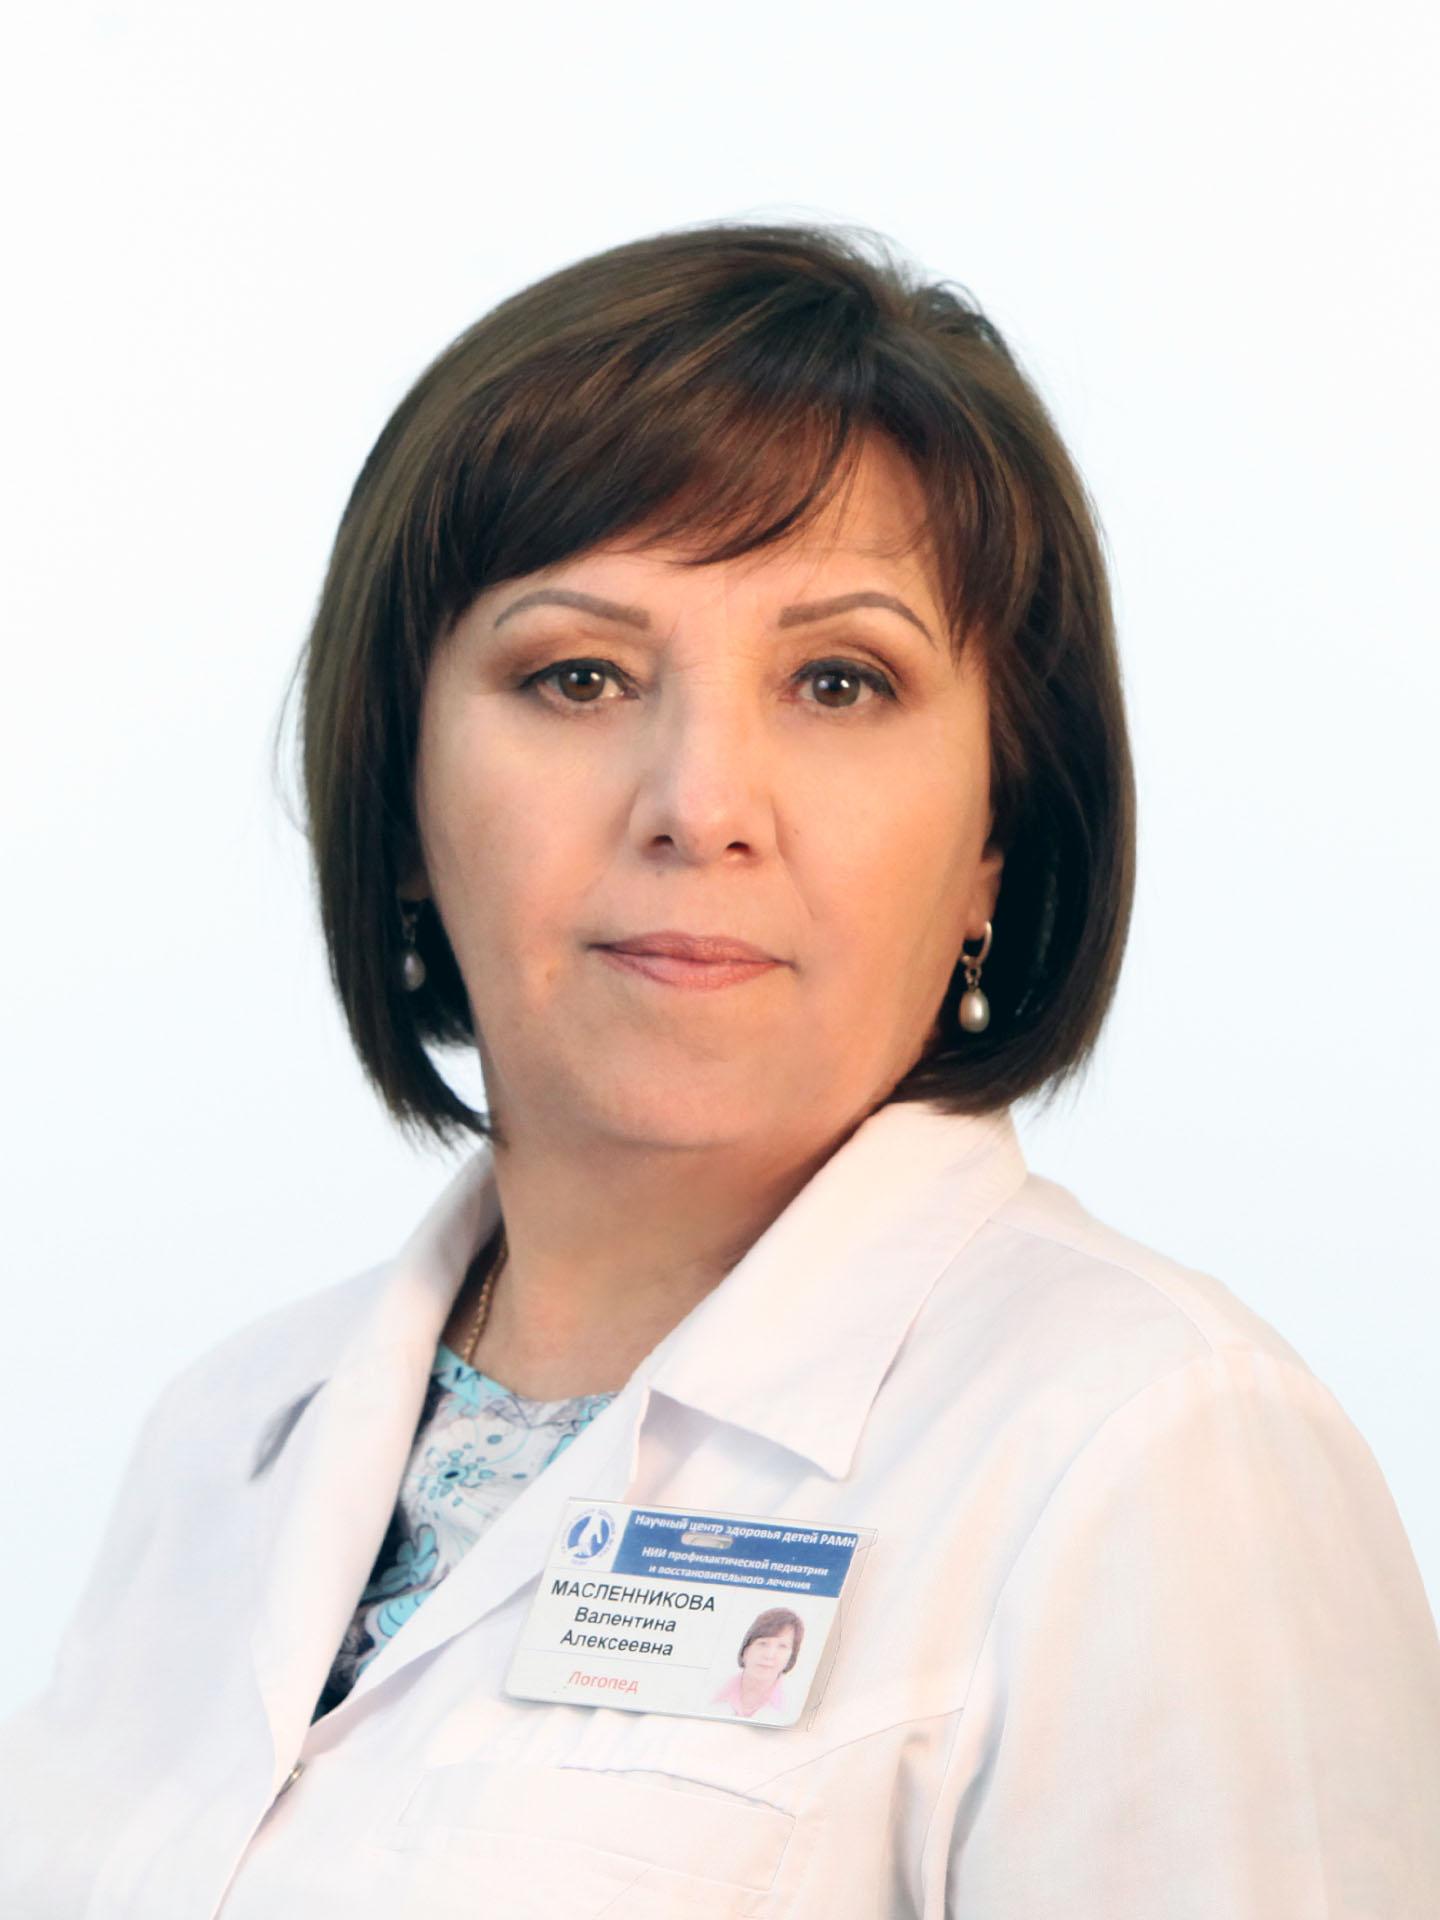 Масленникова Валентина Алексеевна